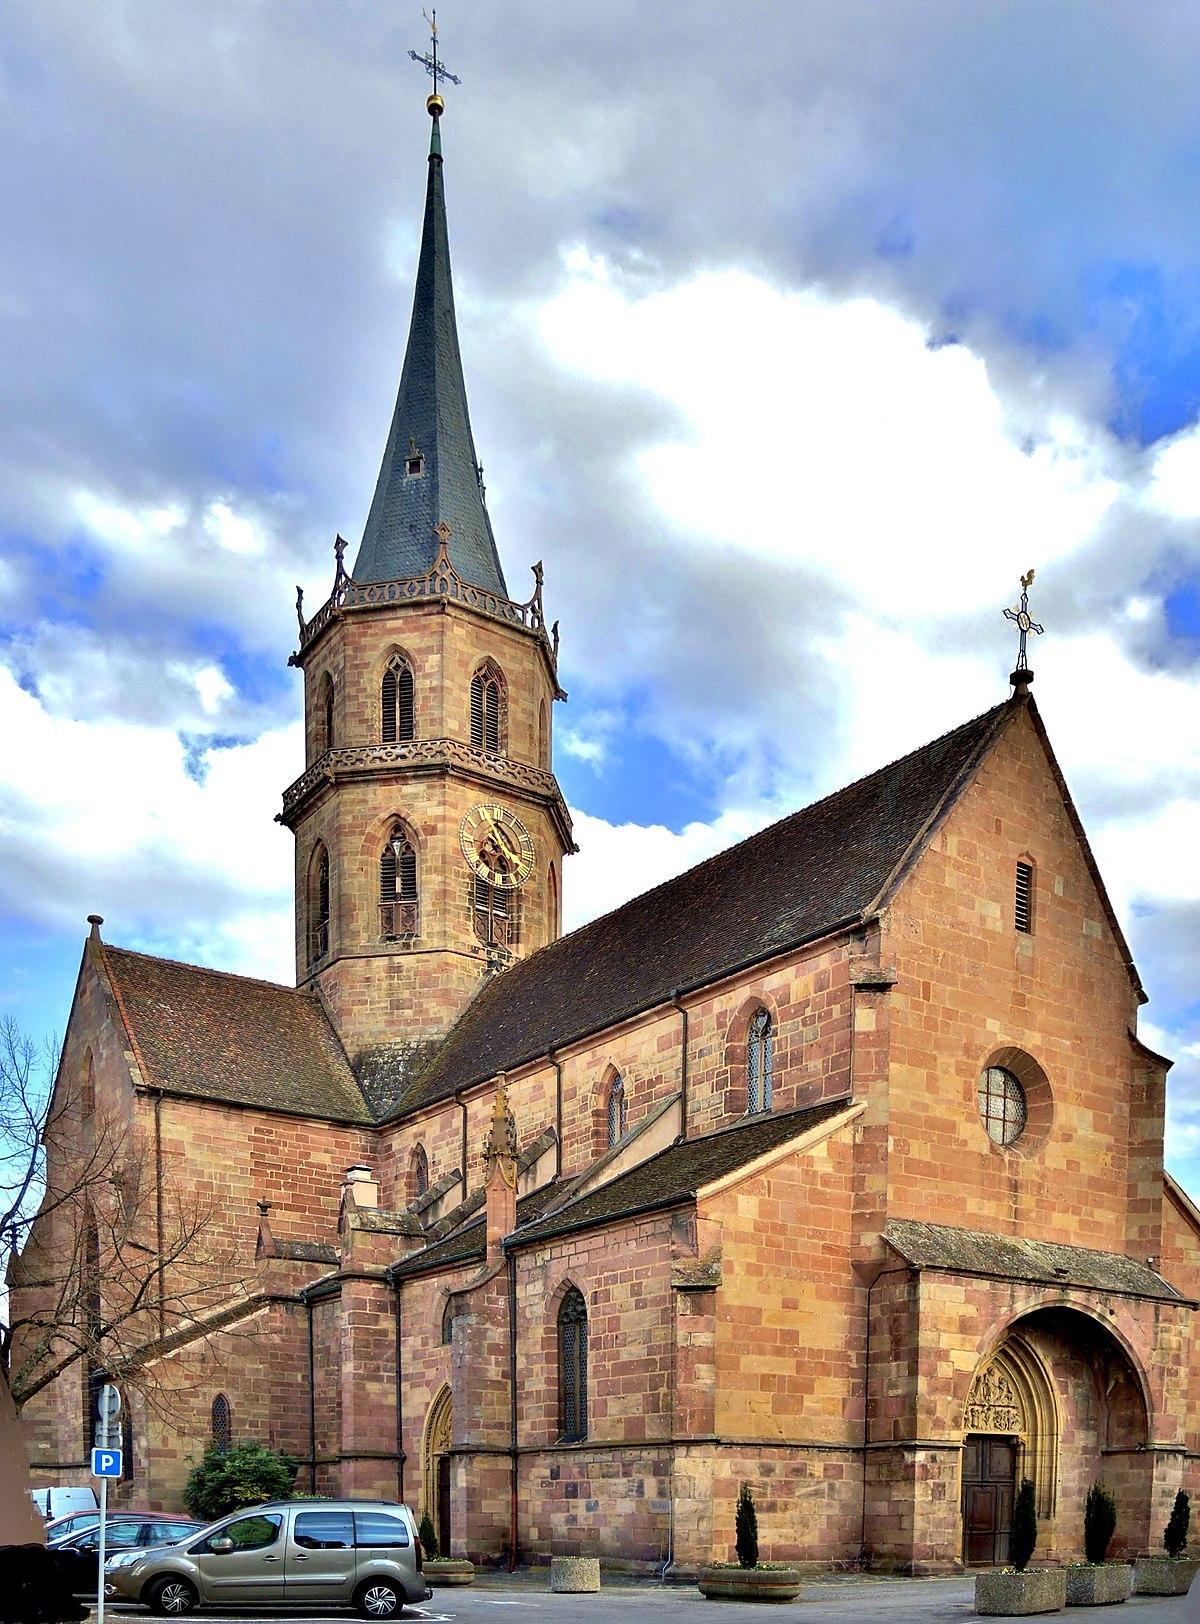 Église Saint-Maurice, Soultz-Haut-Rhin - Wikipedia